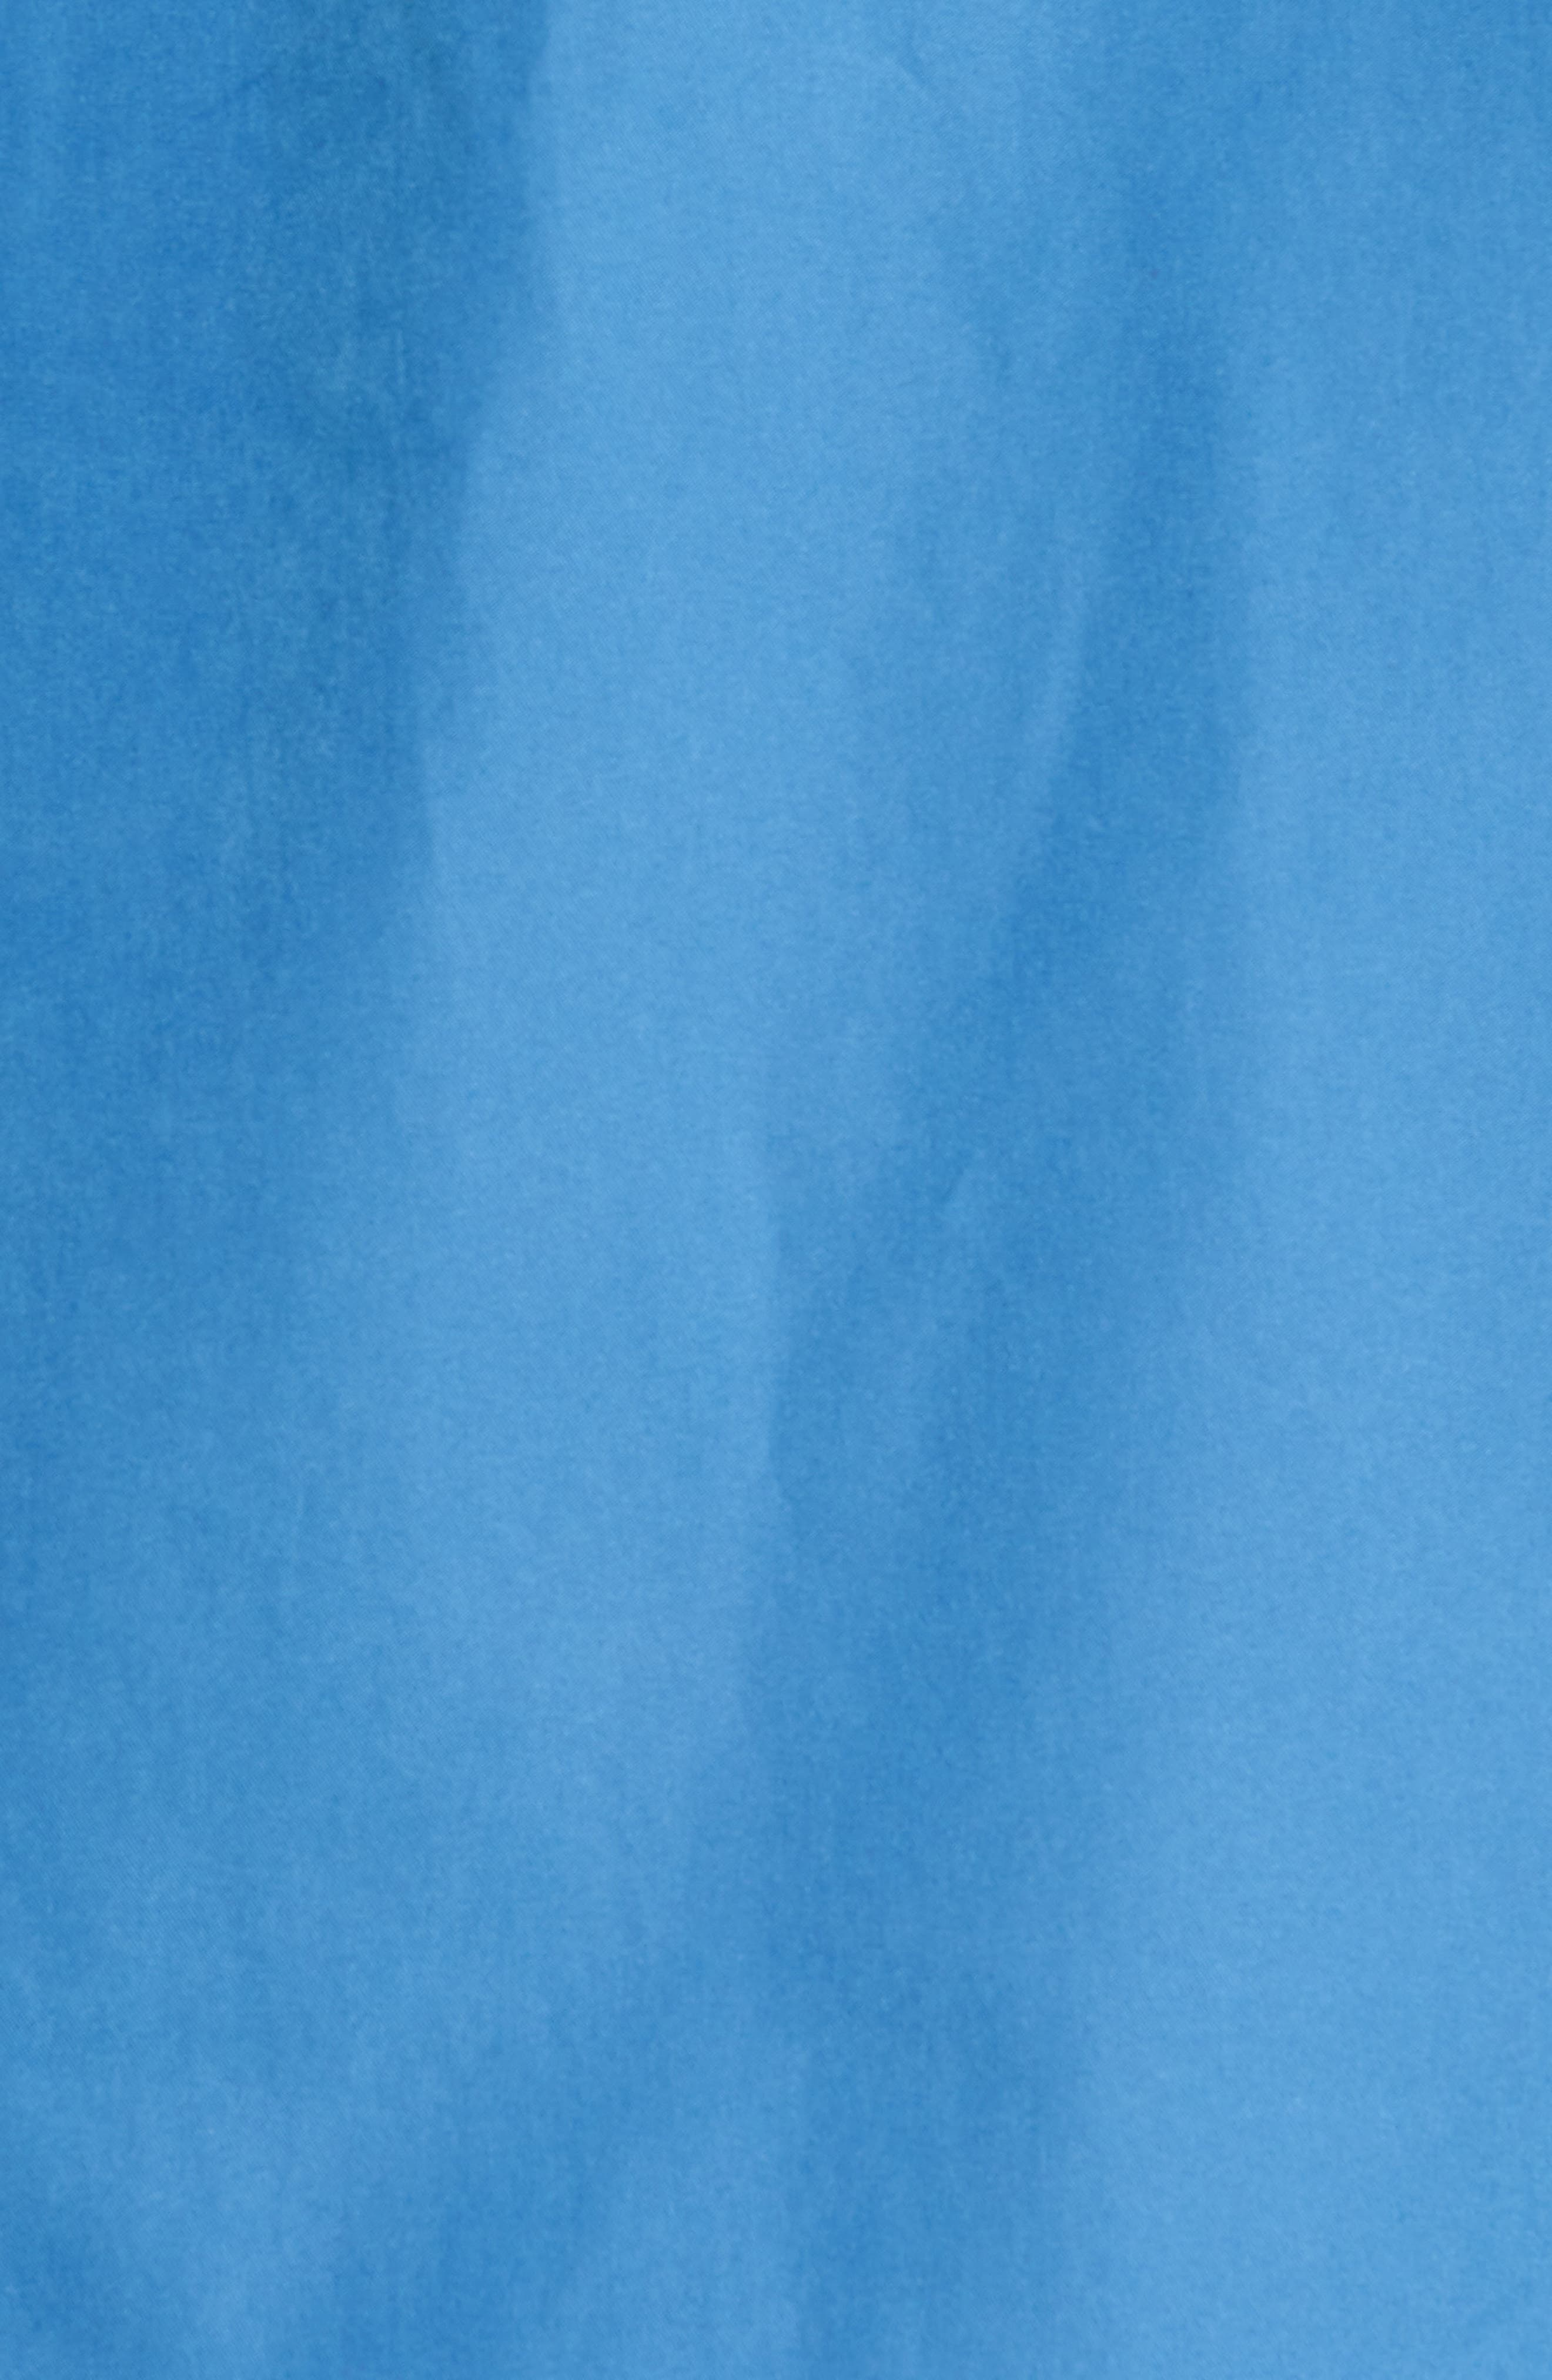 Paul&Shark Water Repellent Microfiber Jacket,                             Alternate thumbnail 5, color,                             Blue